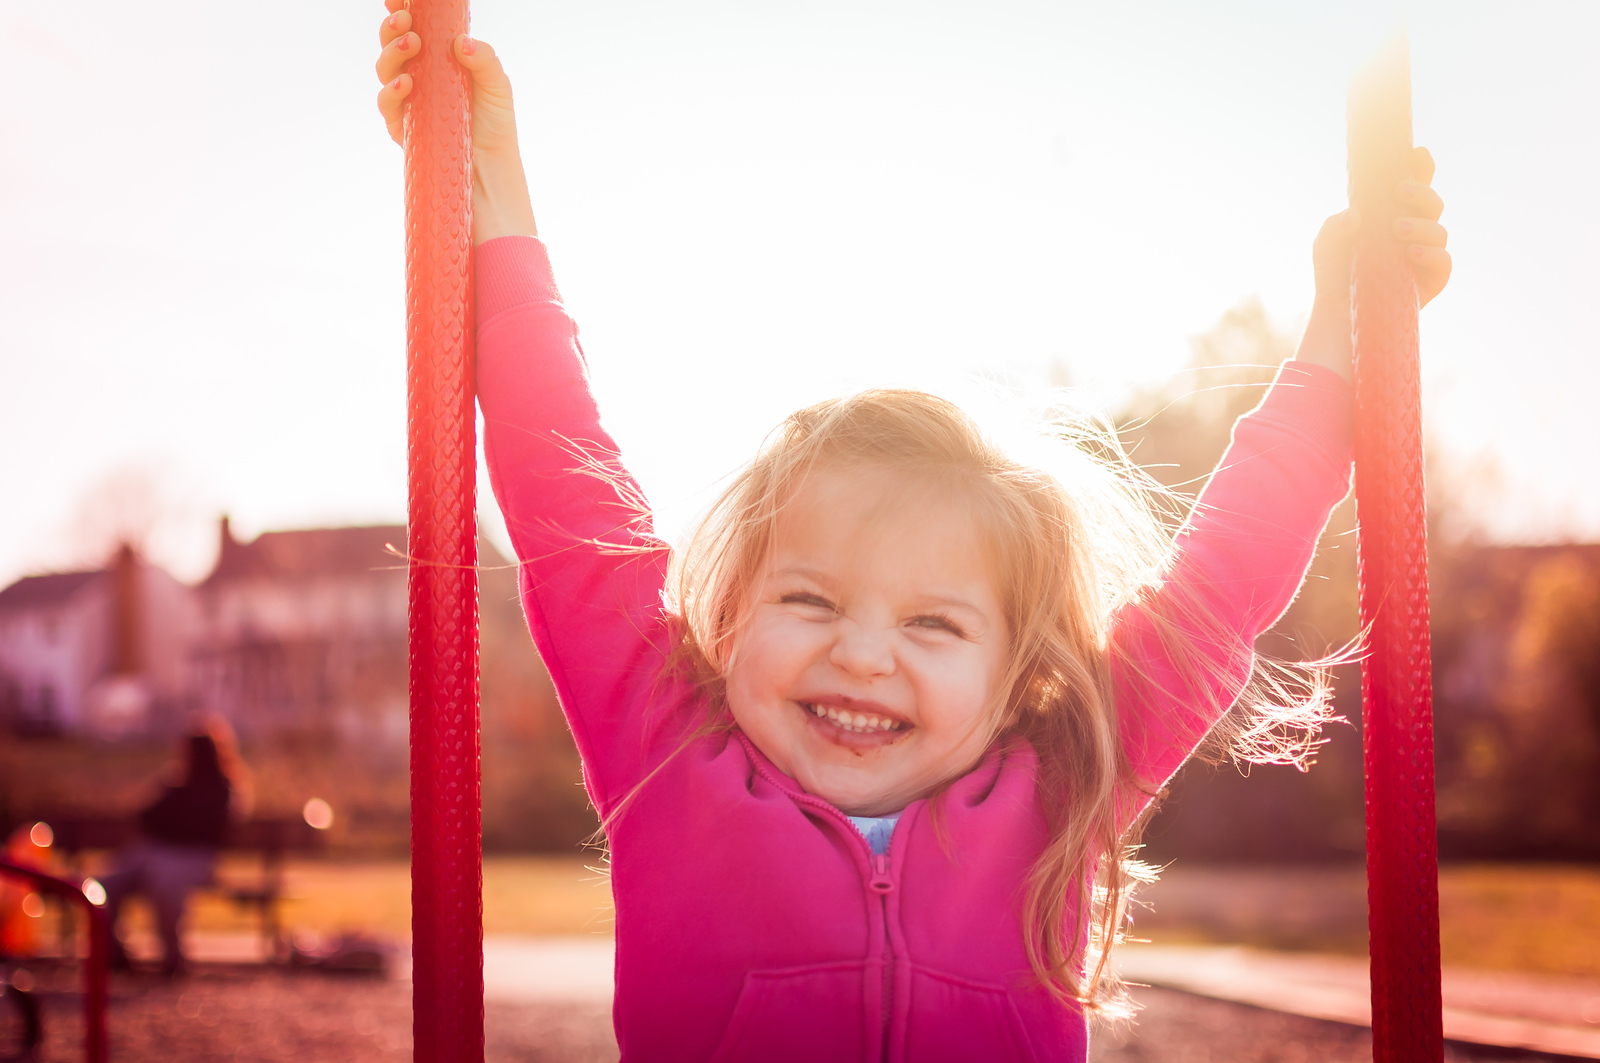 You Are My Sunshine - February 8